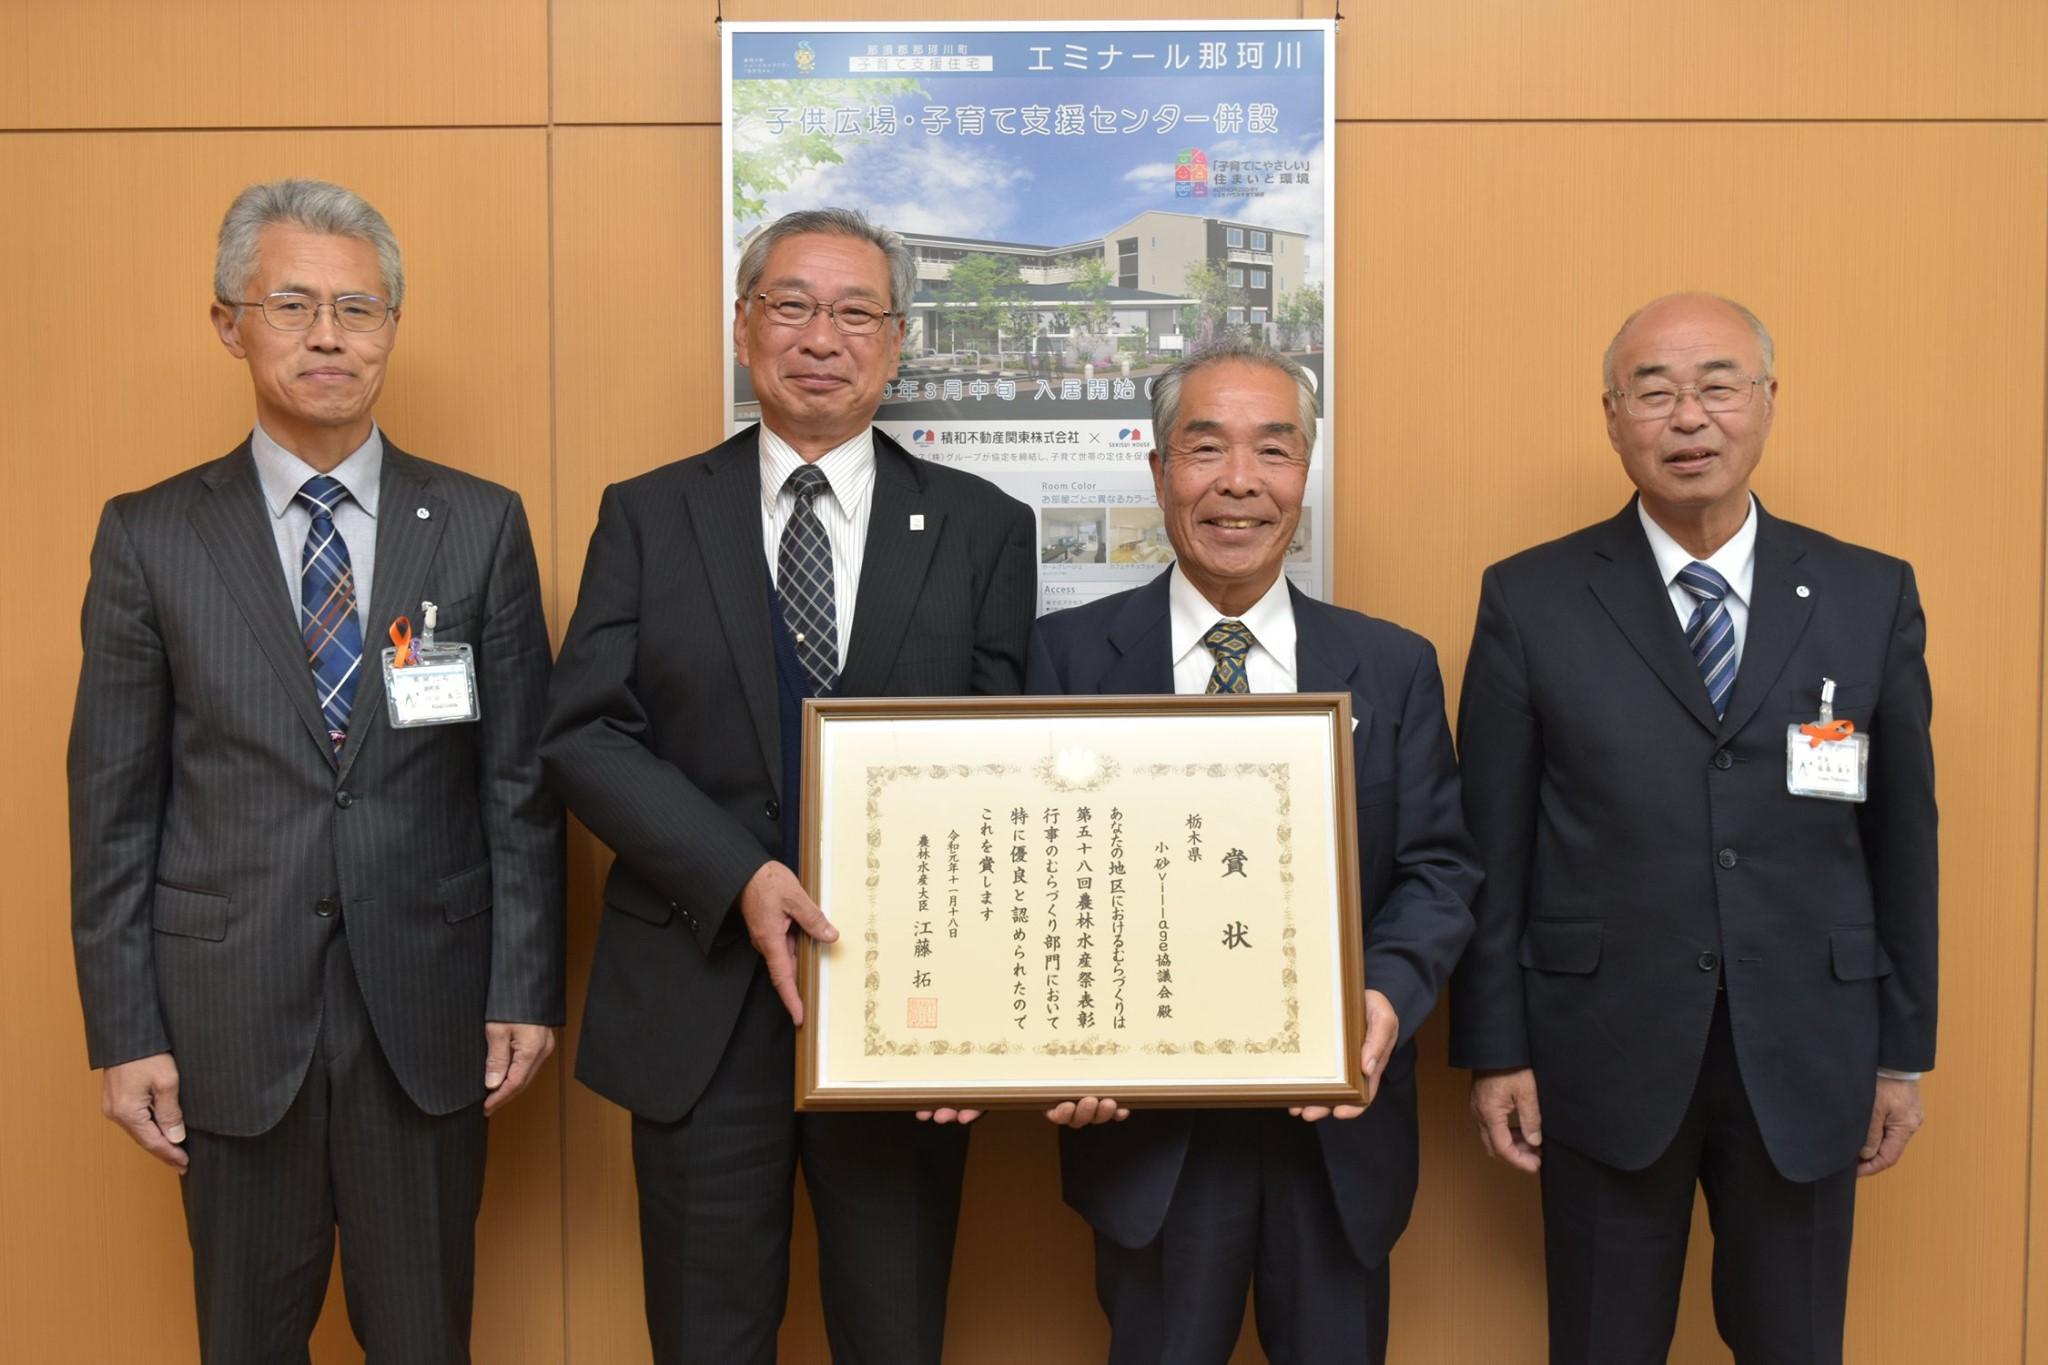 小砂地区が「農林水産大臣賞」を受賞